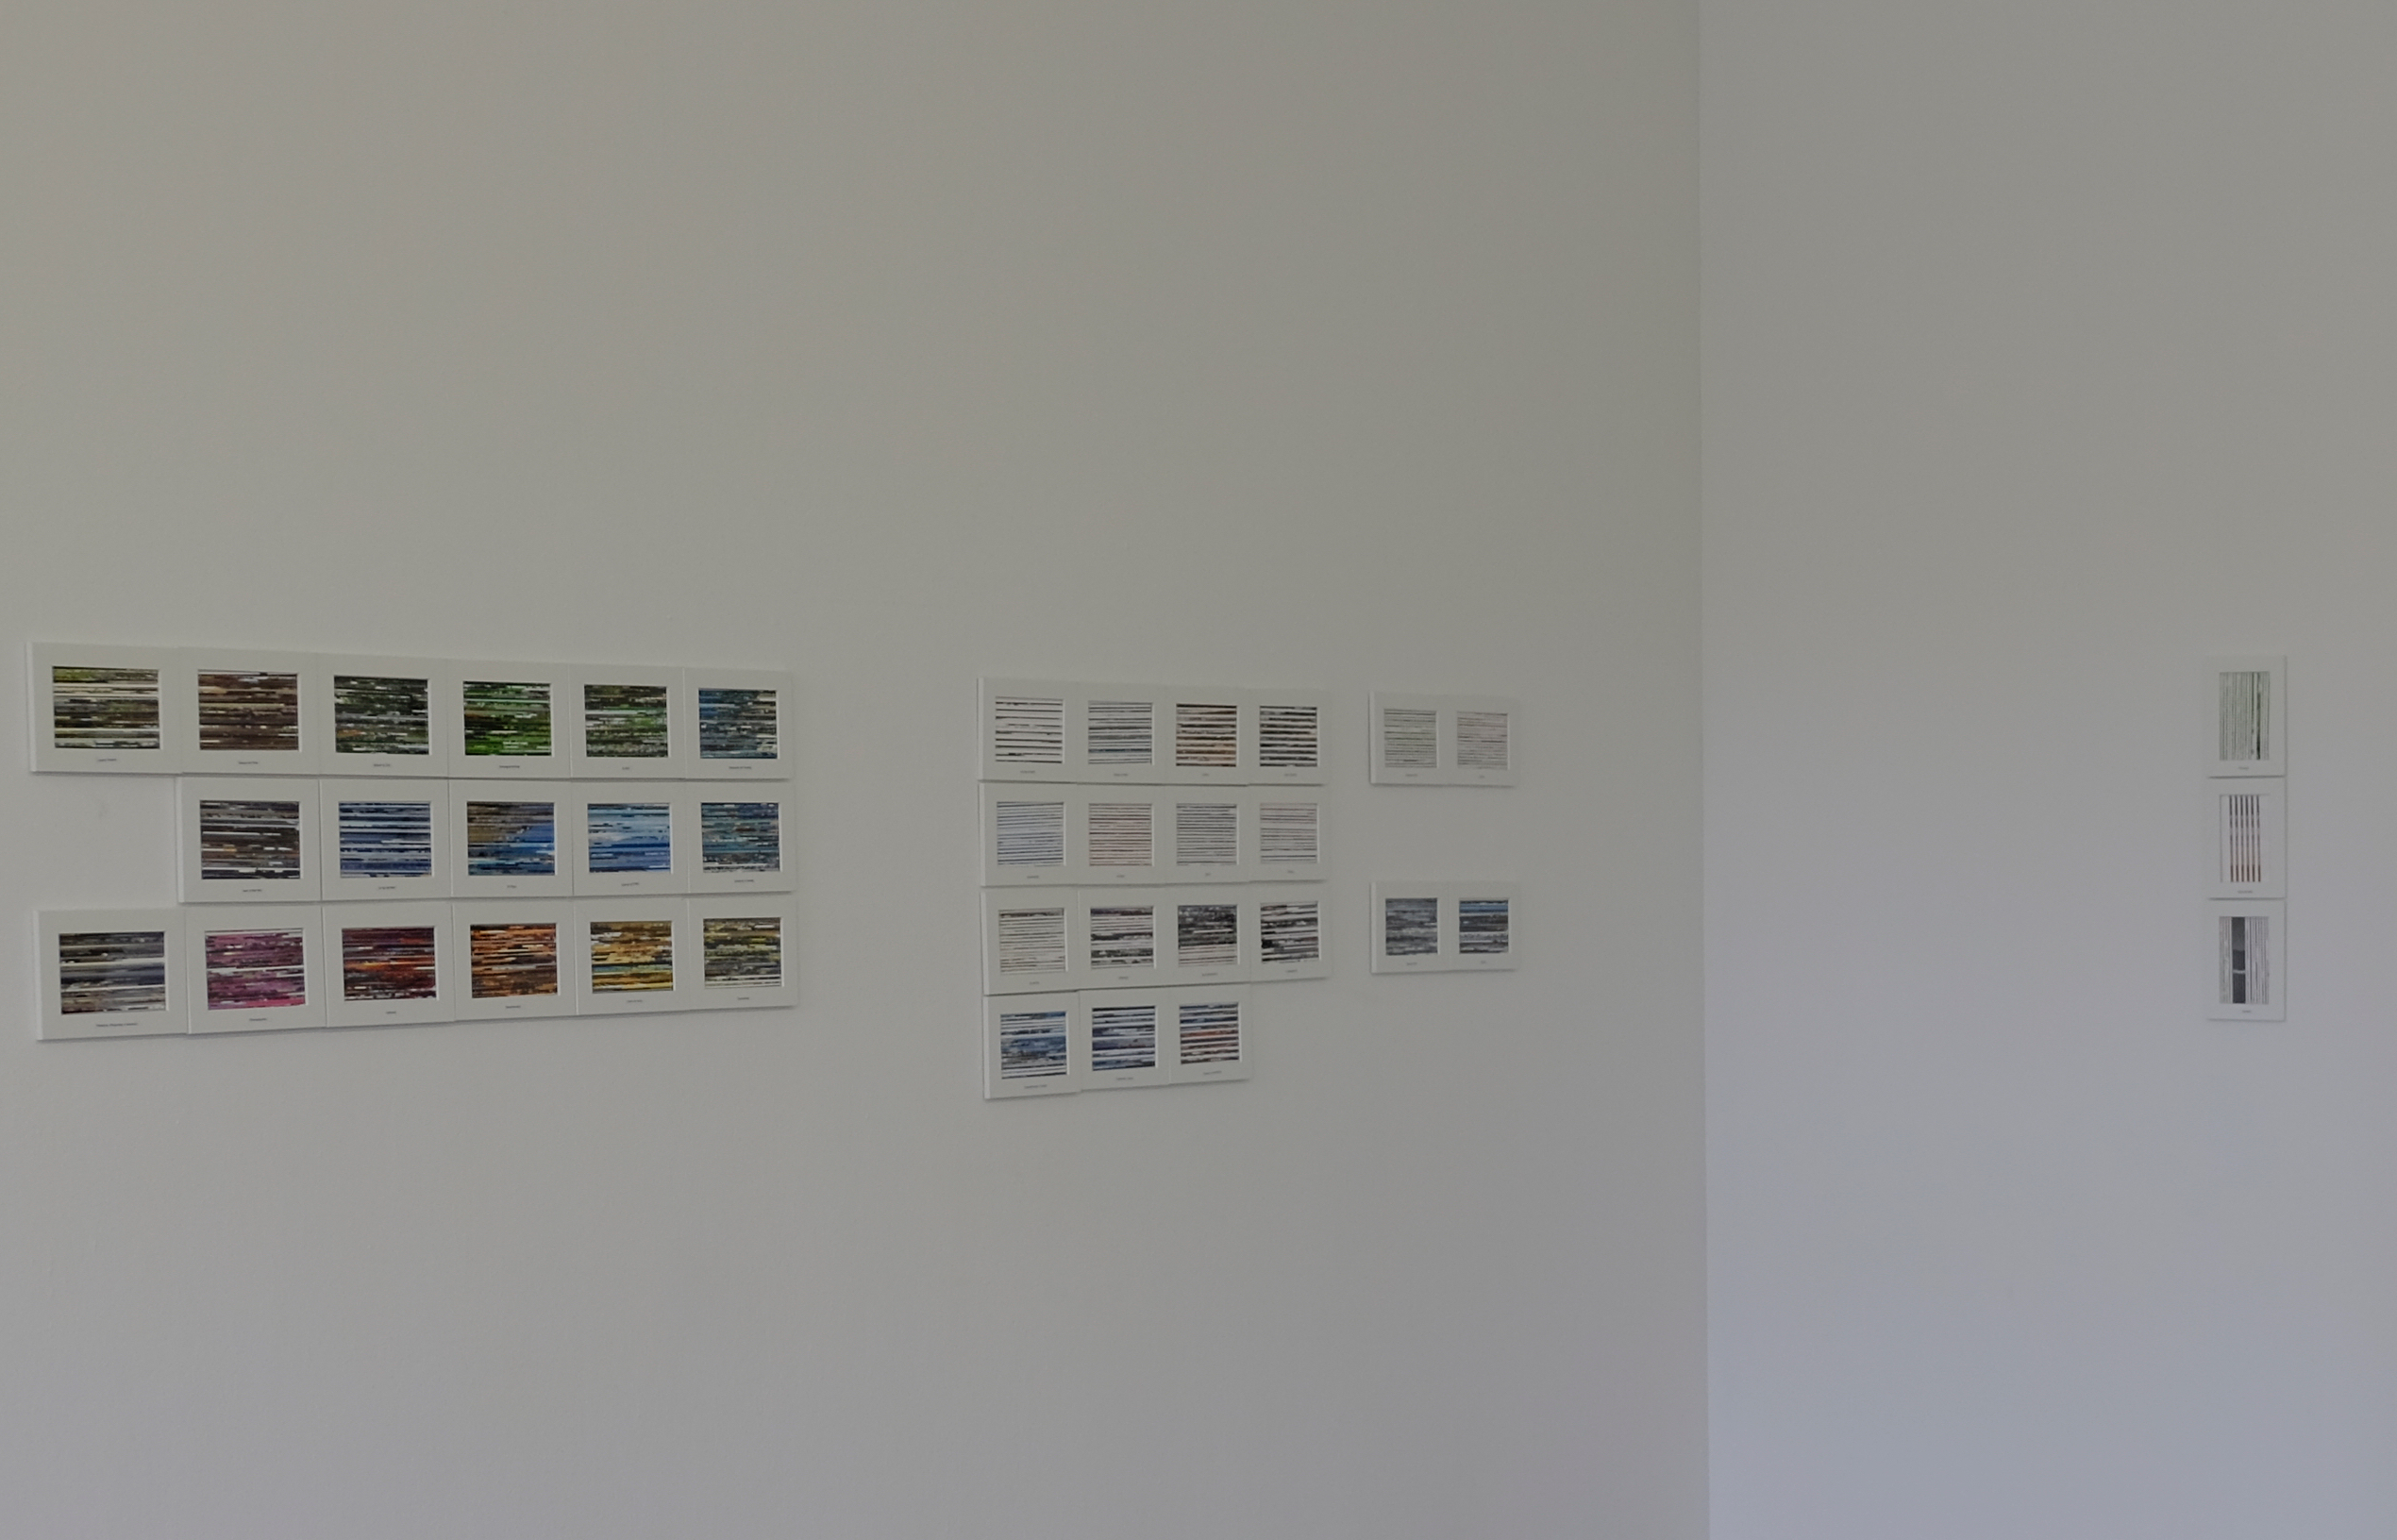 Datenschürze (Ansicht aus der Ausstellung)